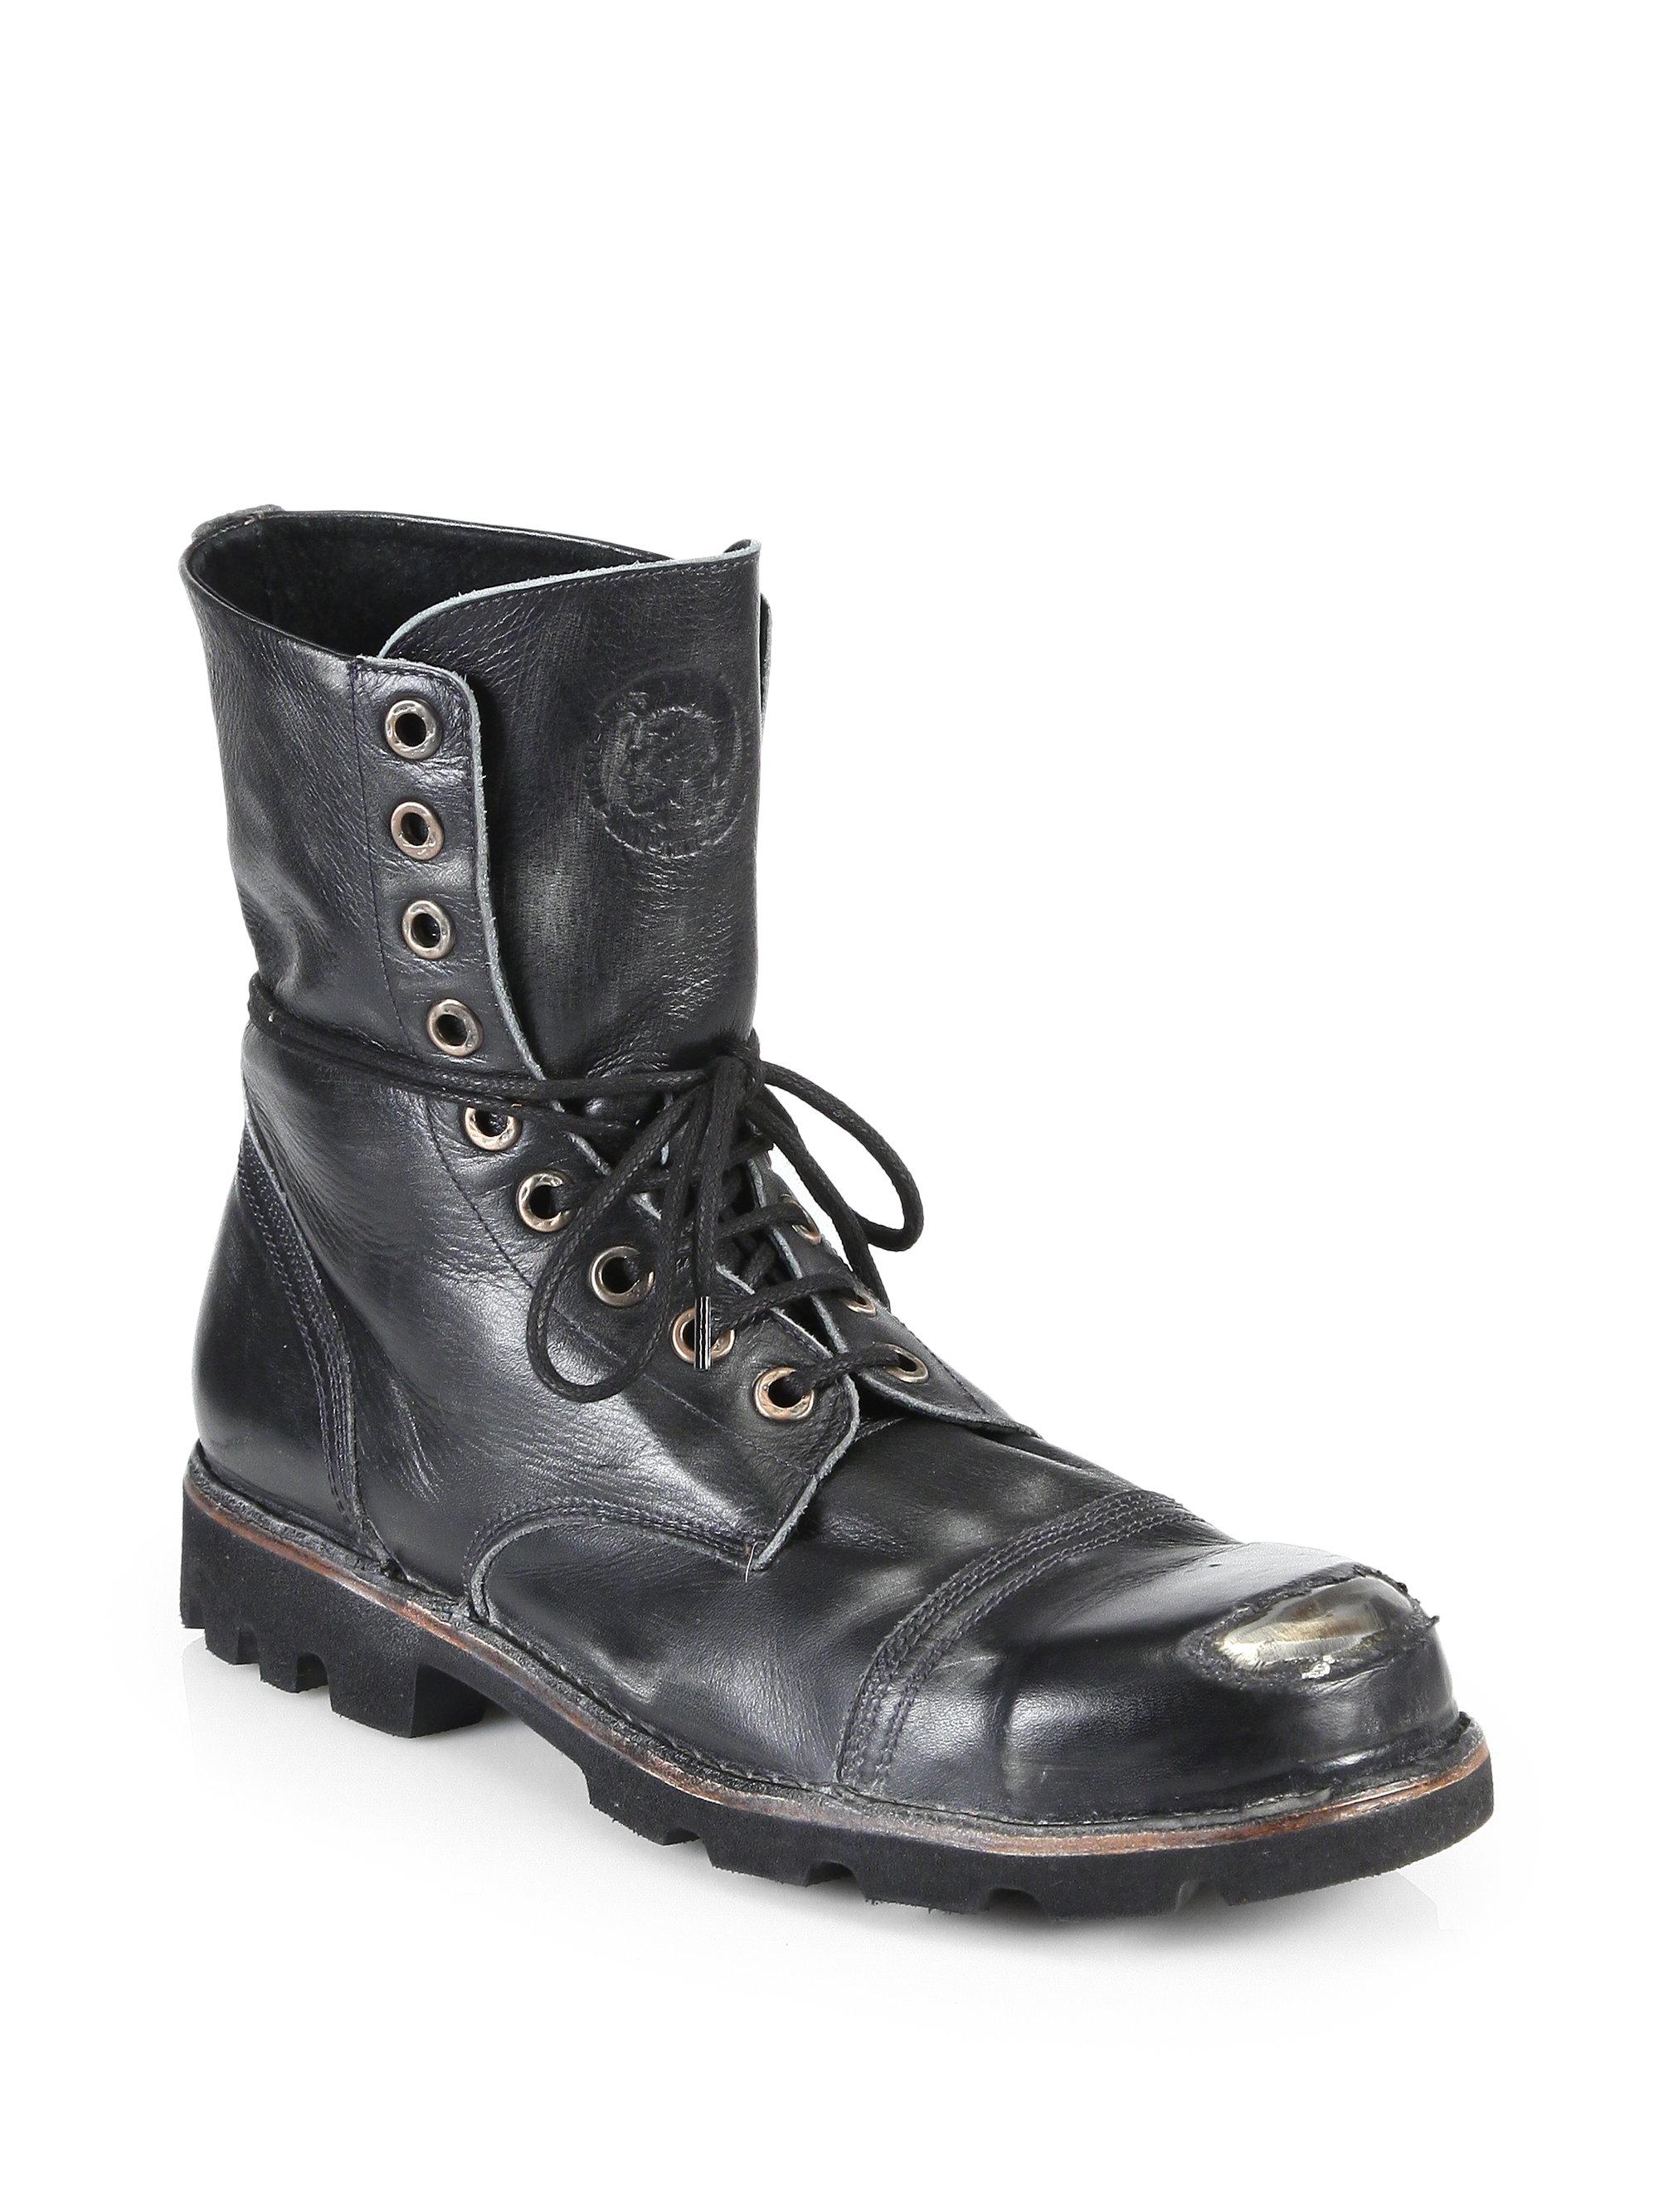 Lyst Diesel Hardkor Steel Lace Up Boots In Black For Men